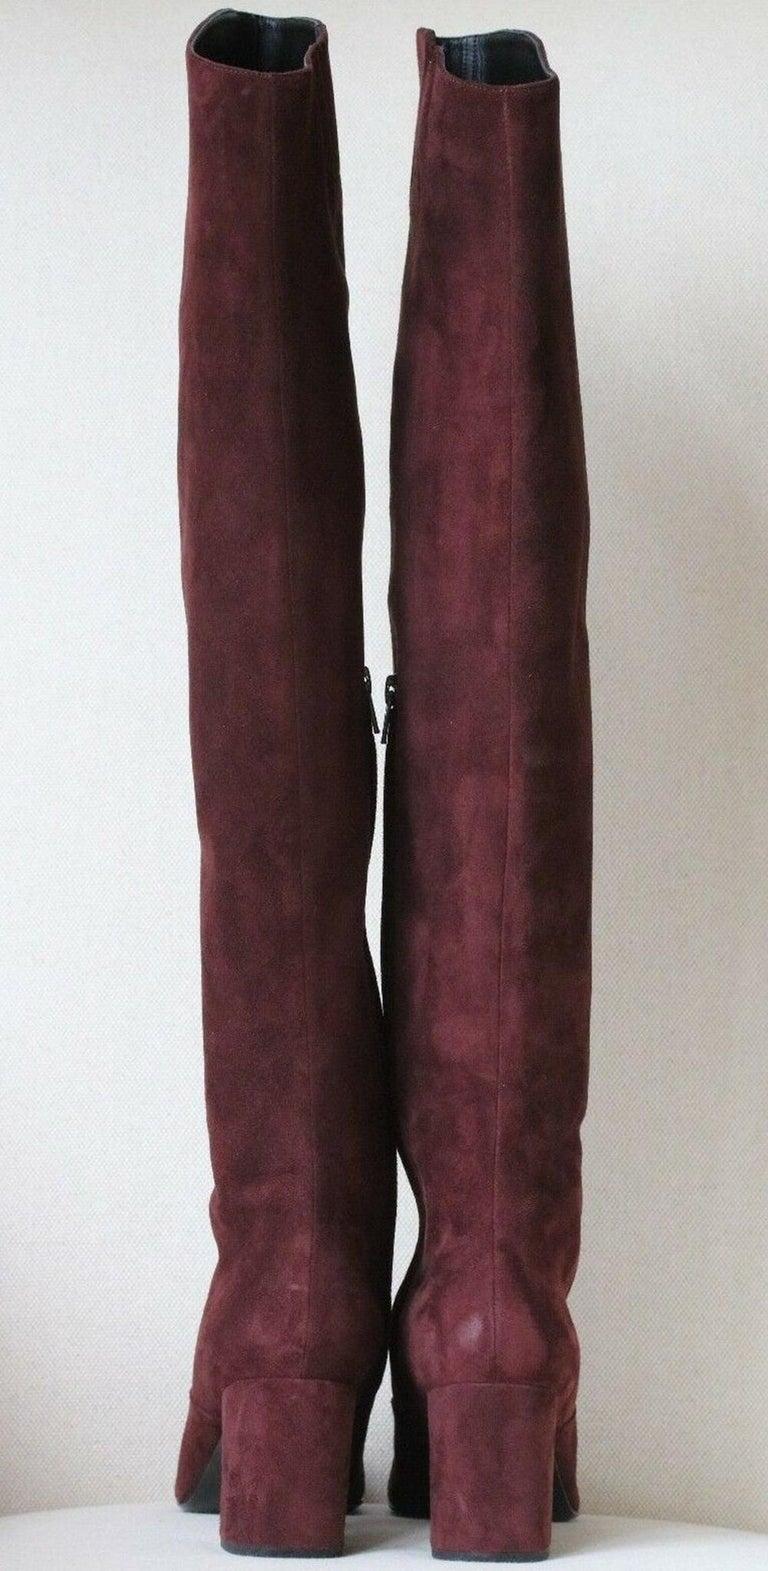 Black Saint Laurent BB 70 Over-the-Knee Suede Boots